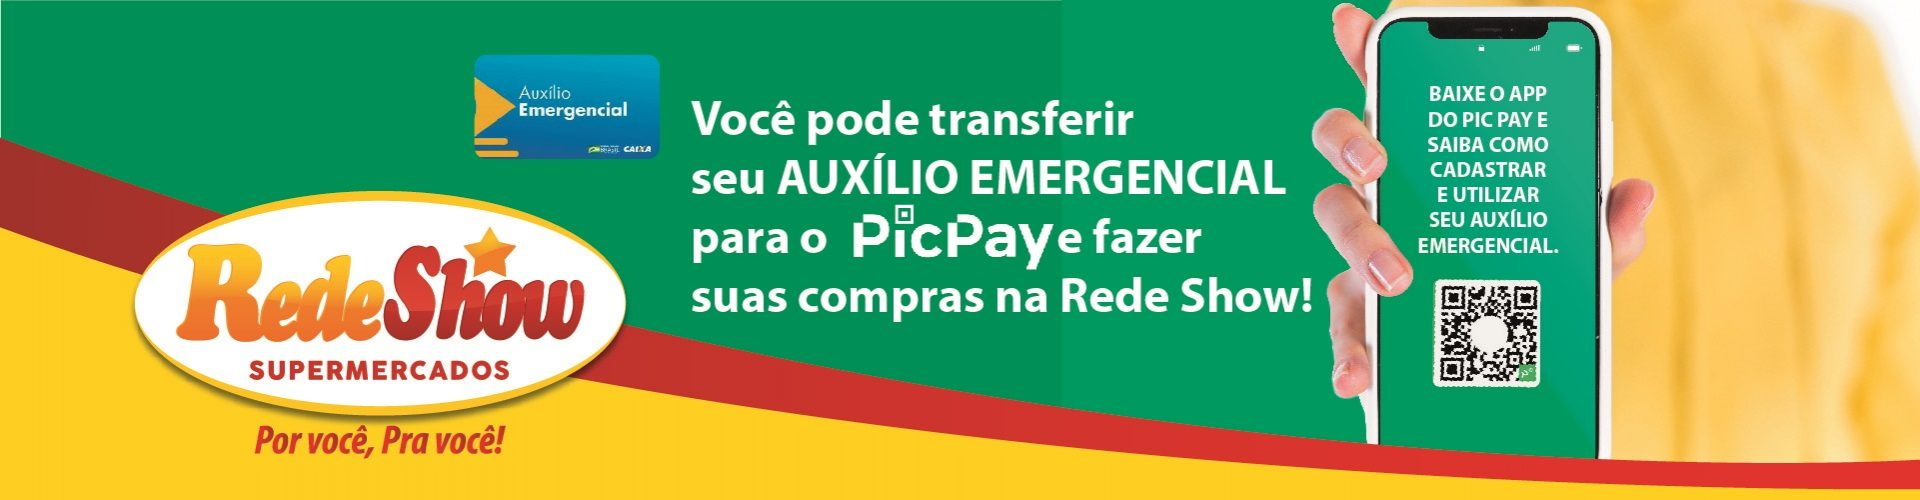 banner_1920x500_Auxílio Emergencial